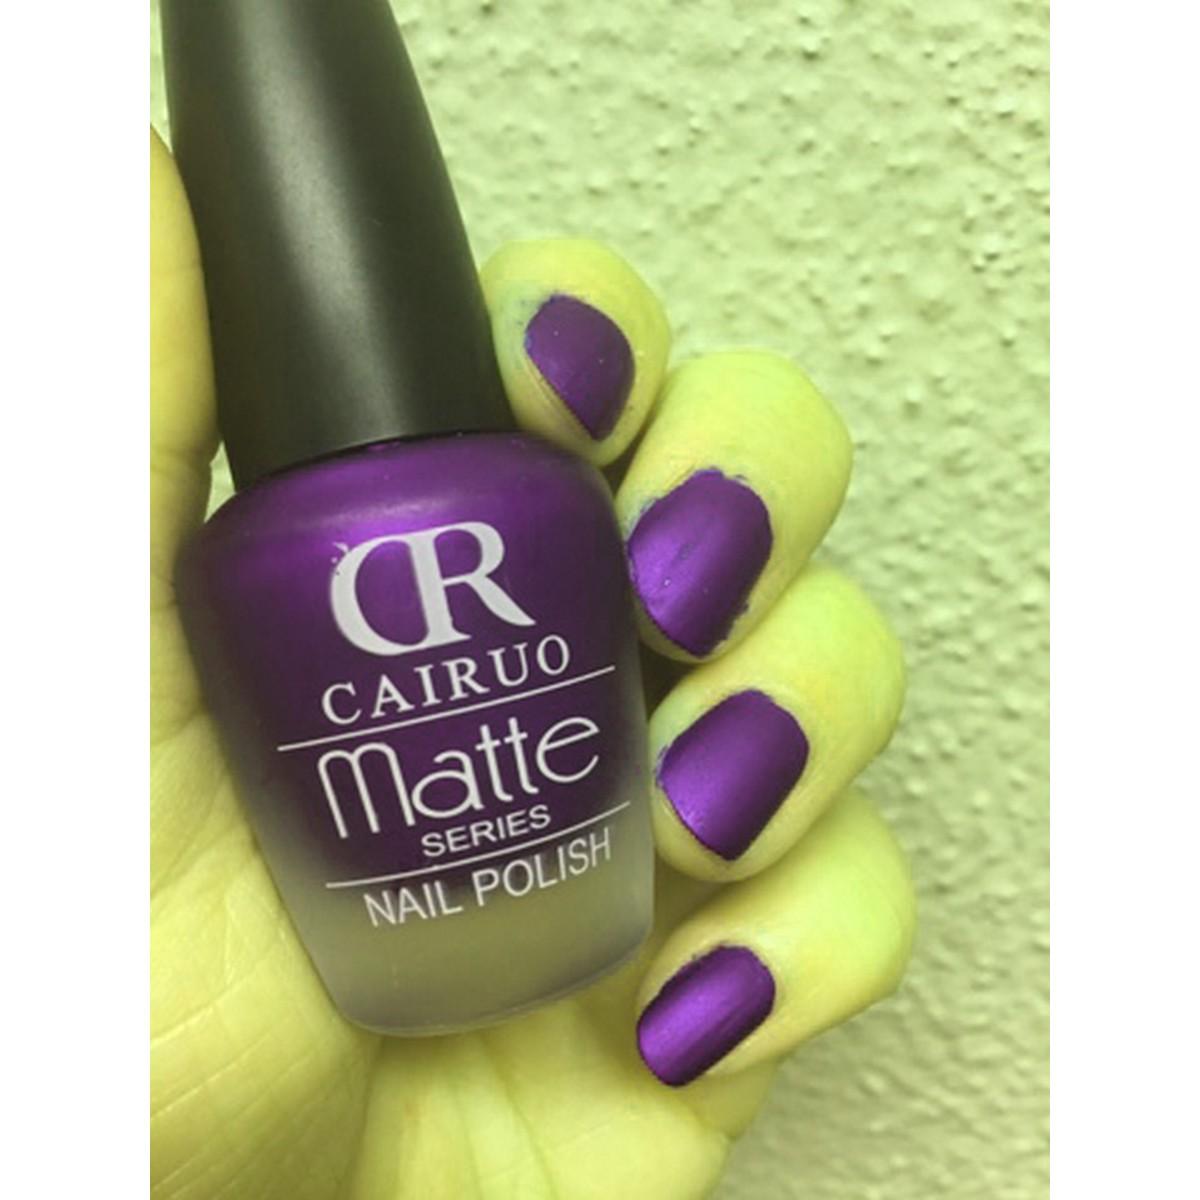 CR Cairuo Matte series high profile long lasting nail polish for women Pure Colour UV Gel Nail Art